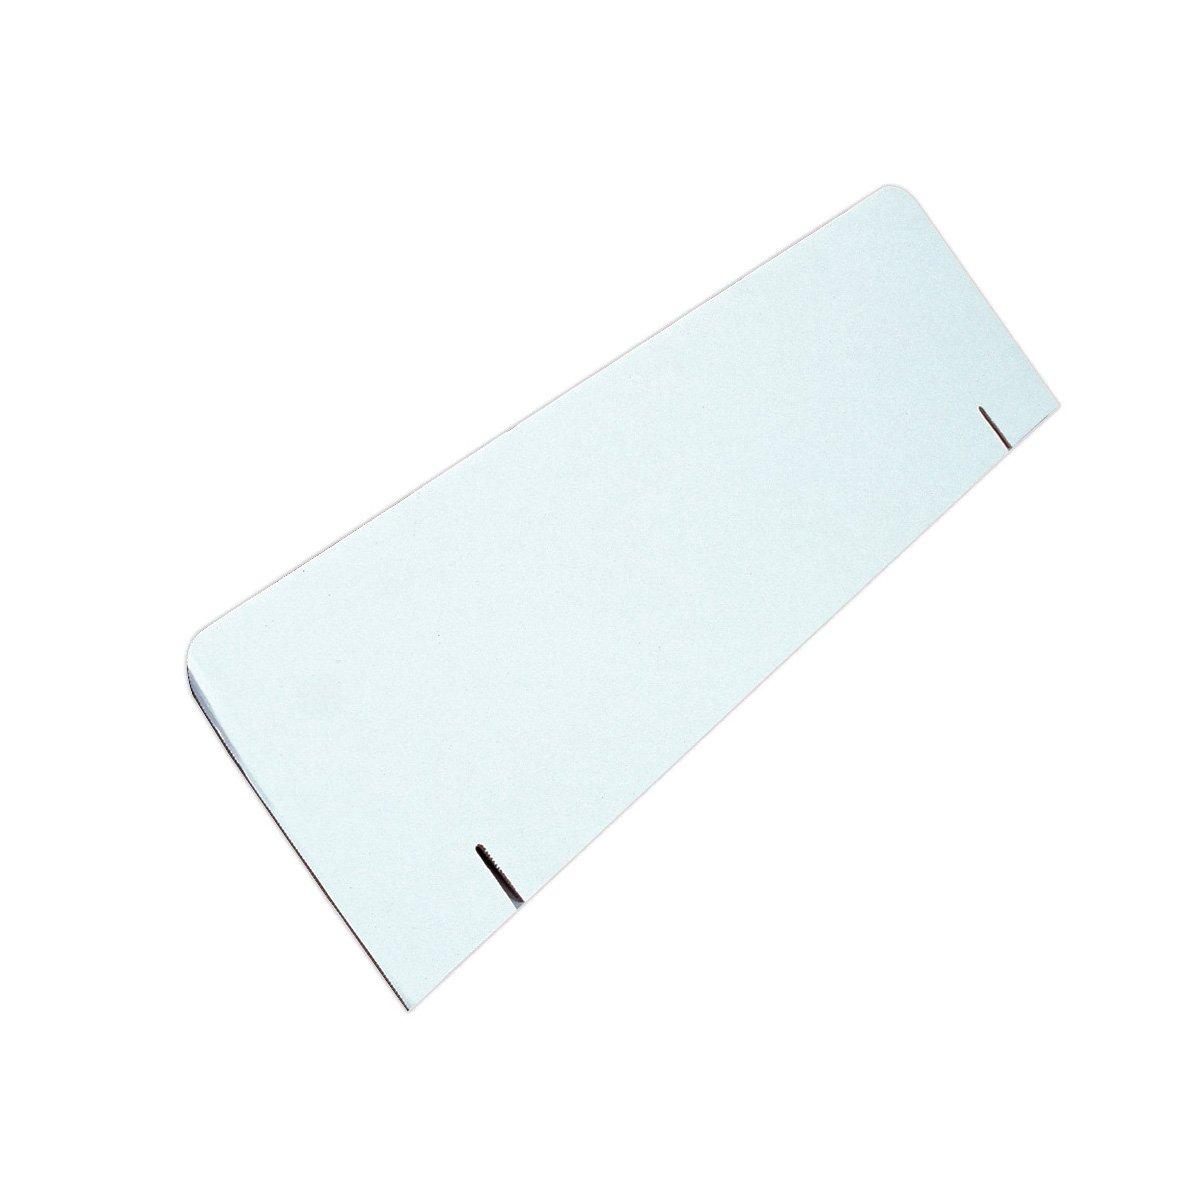 Elmer's Corrugated Tri-Fold Display Board Header Card, 36 x 10 Inches, White (730320)